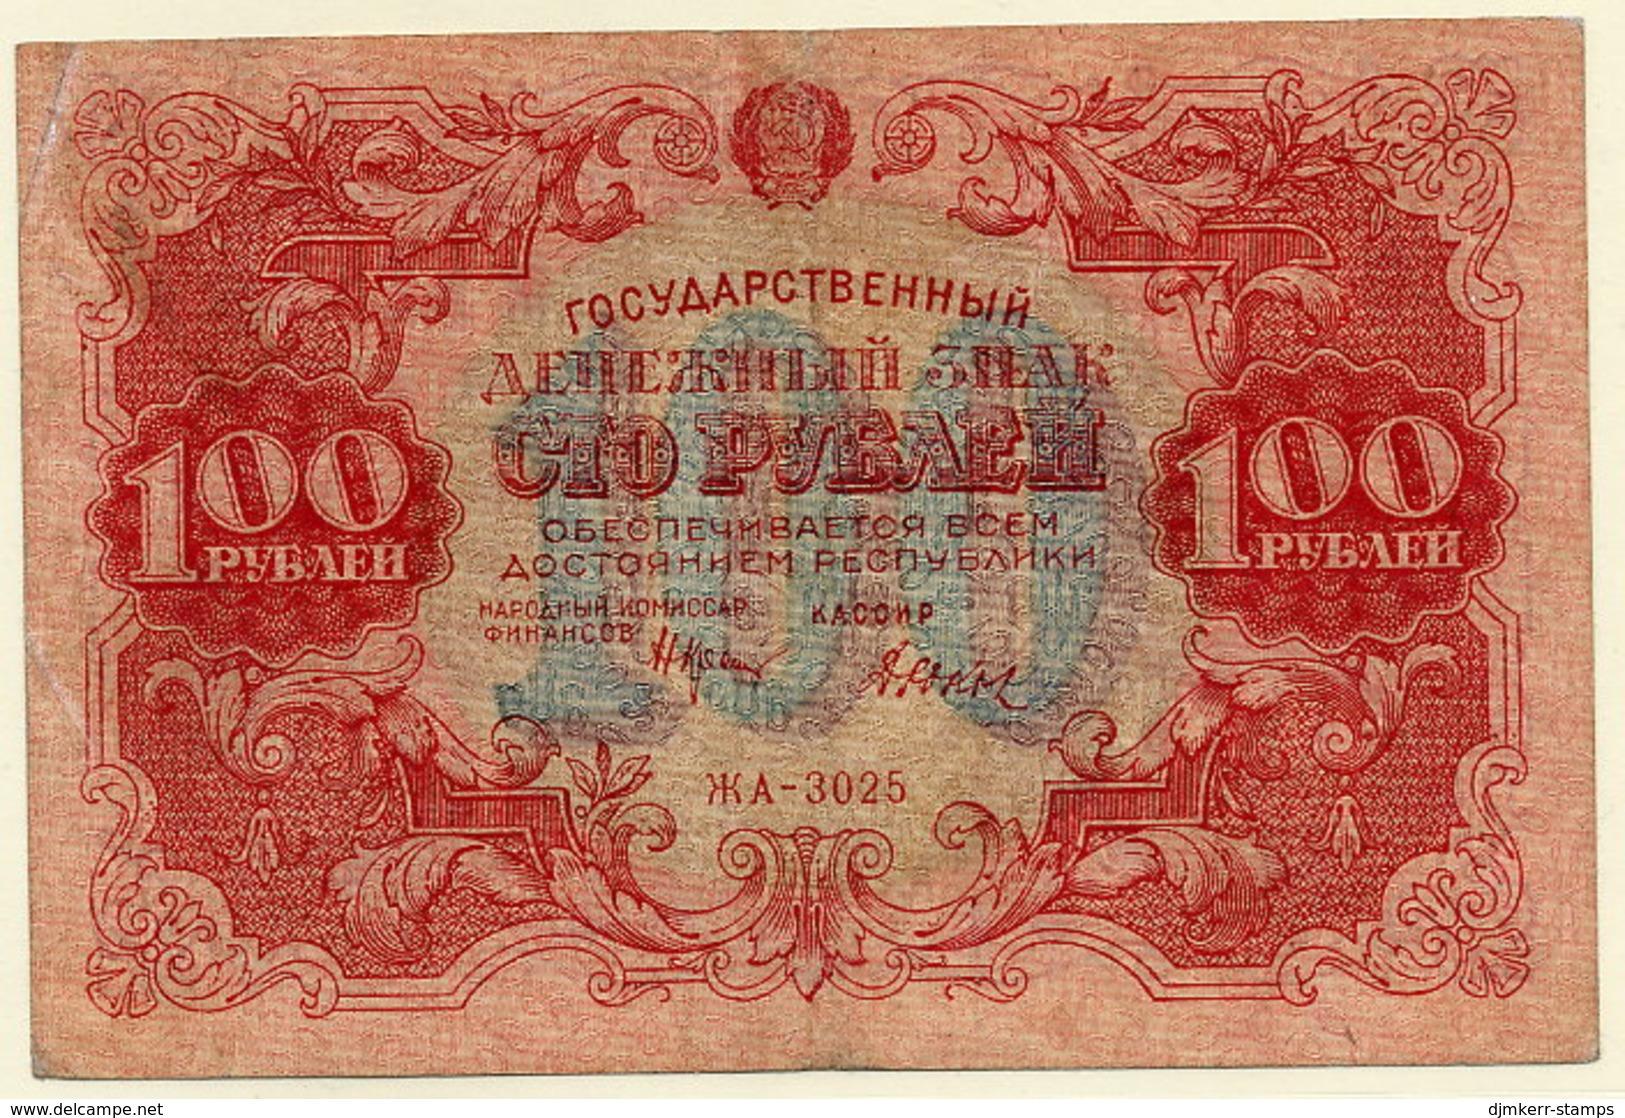 RSFSR 1922 100 Rub.  XF  P133 - Russia